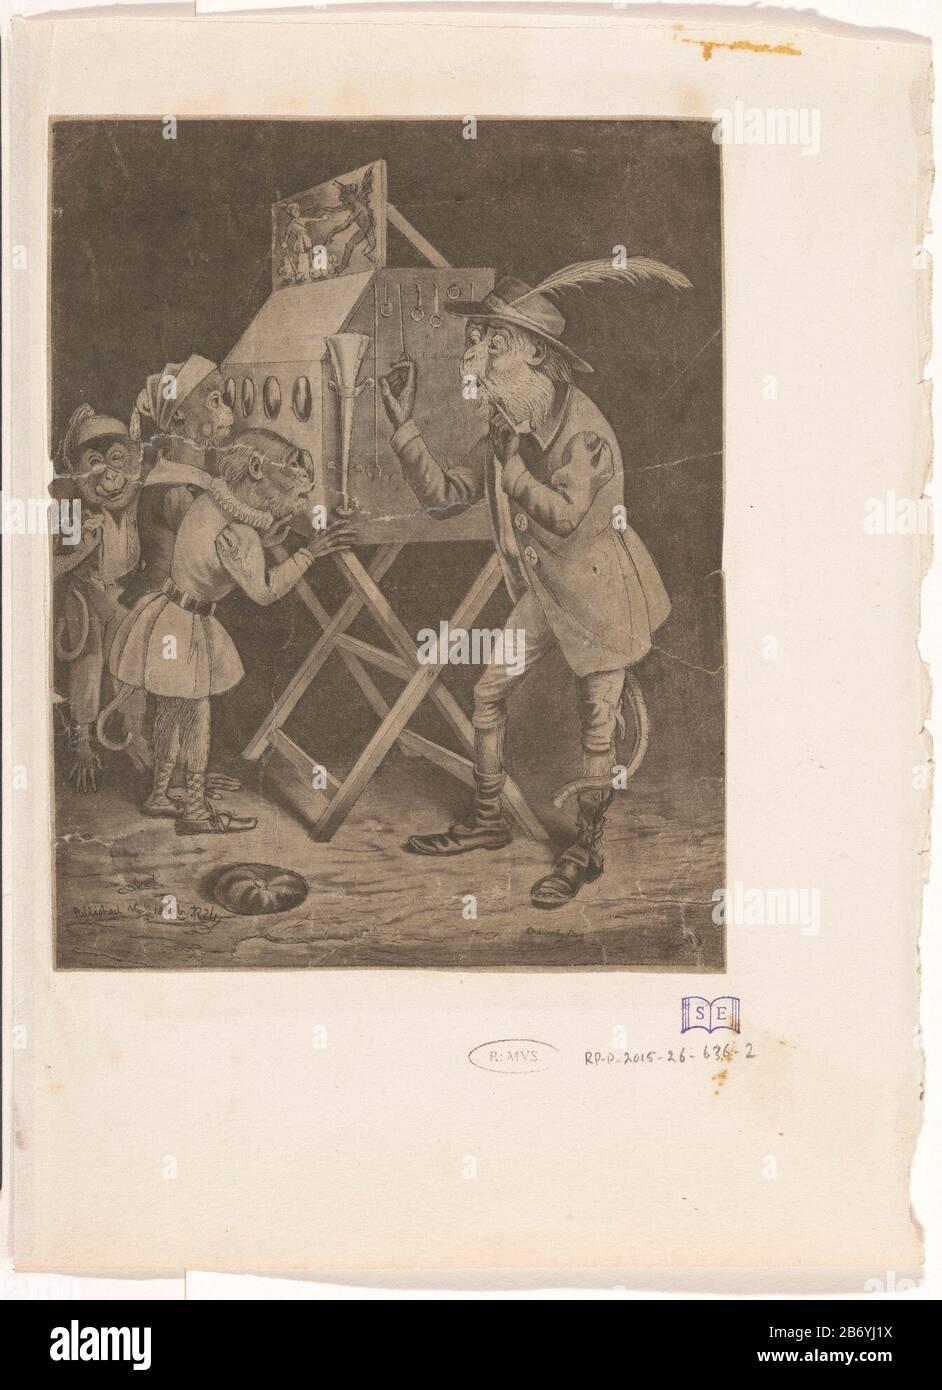 Hedendaags Kijkkast met apen Three monkeys in children for check box on KV-05